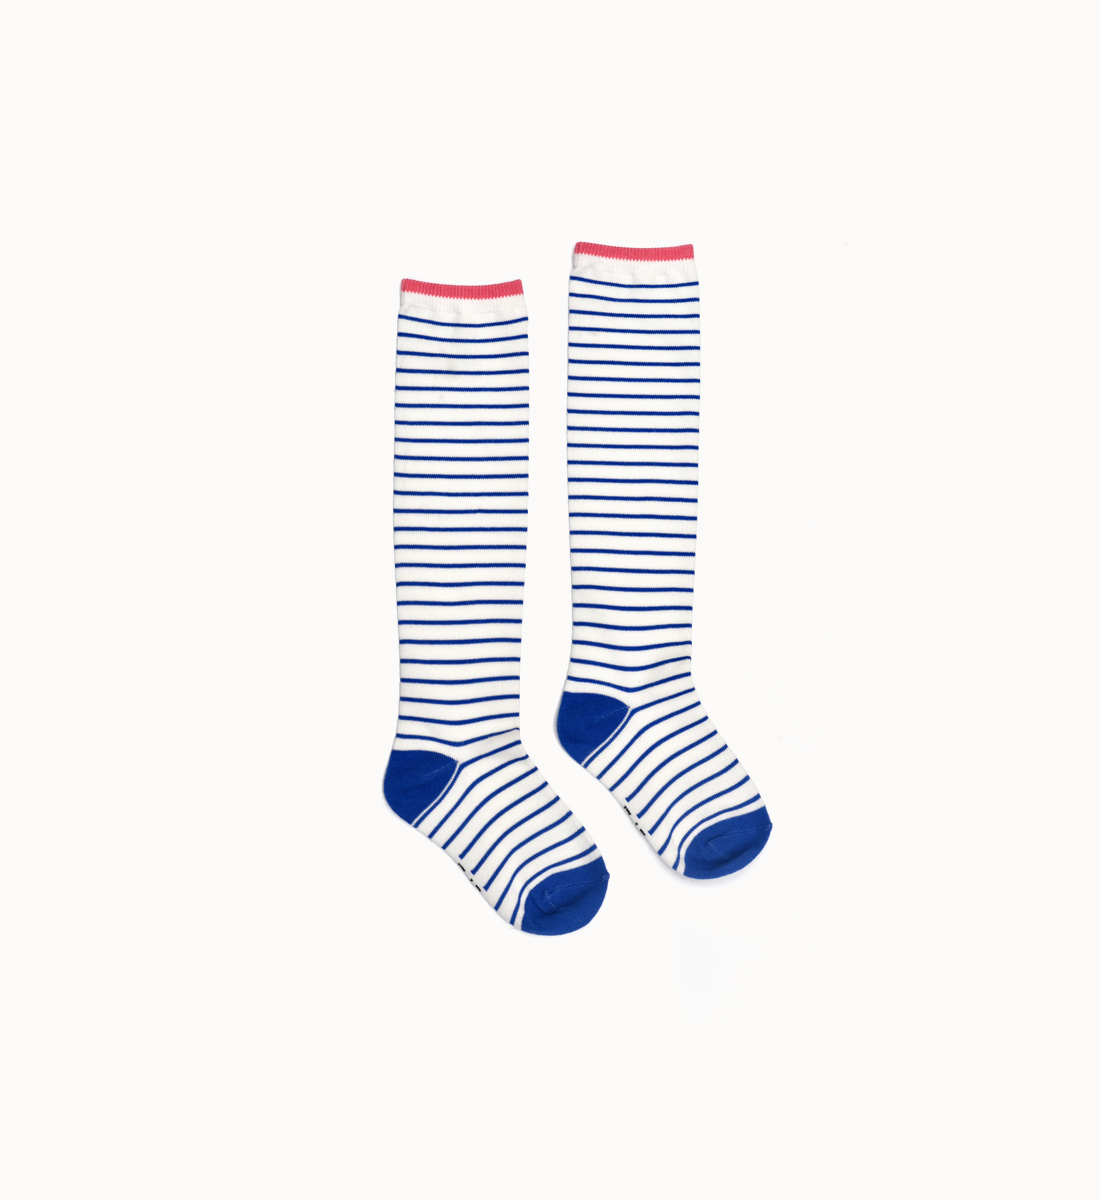 BOXBO 法國時尚雨靴 / 高筒襪-條紋